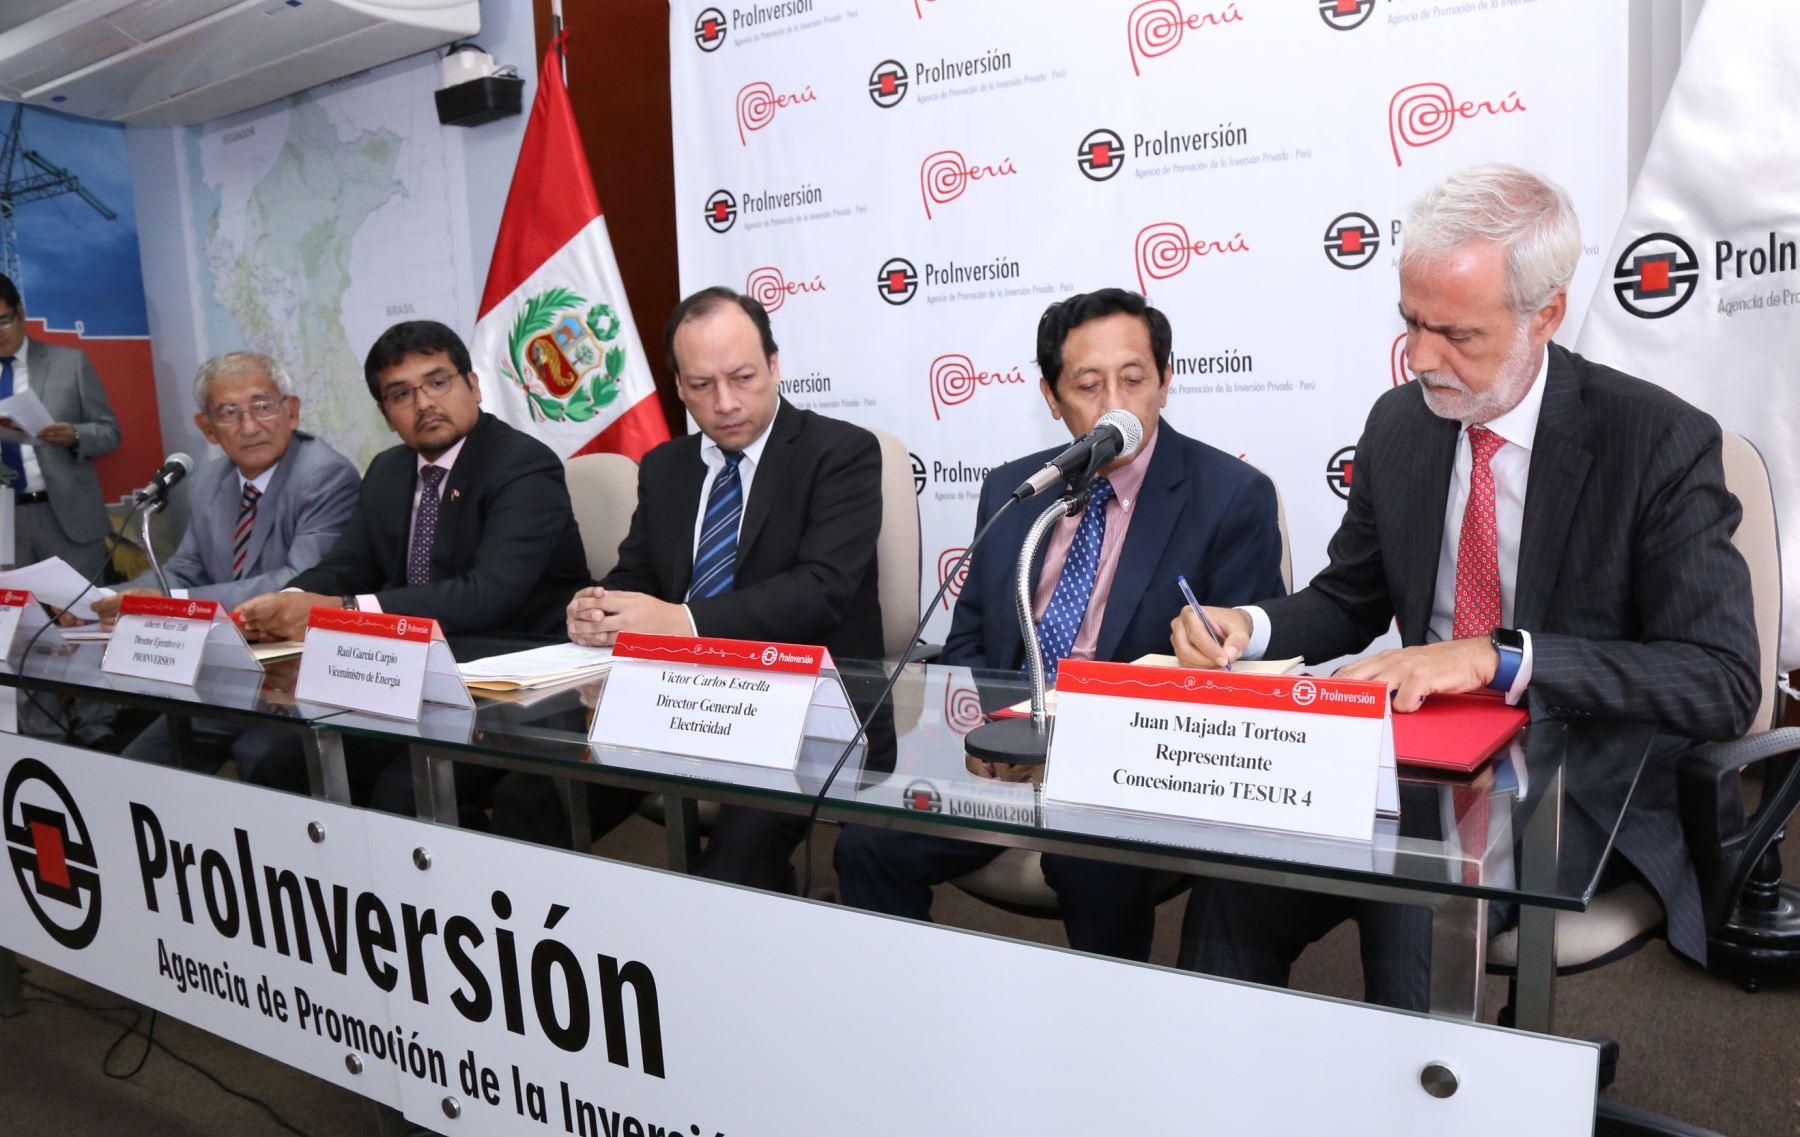 Firma del contrato de concesión del proyecto Línea de Transmisión Eléctrica Tintaya - Azángaro 220v. Foto: ANDINA/Difusión